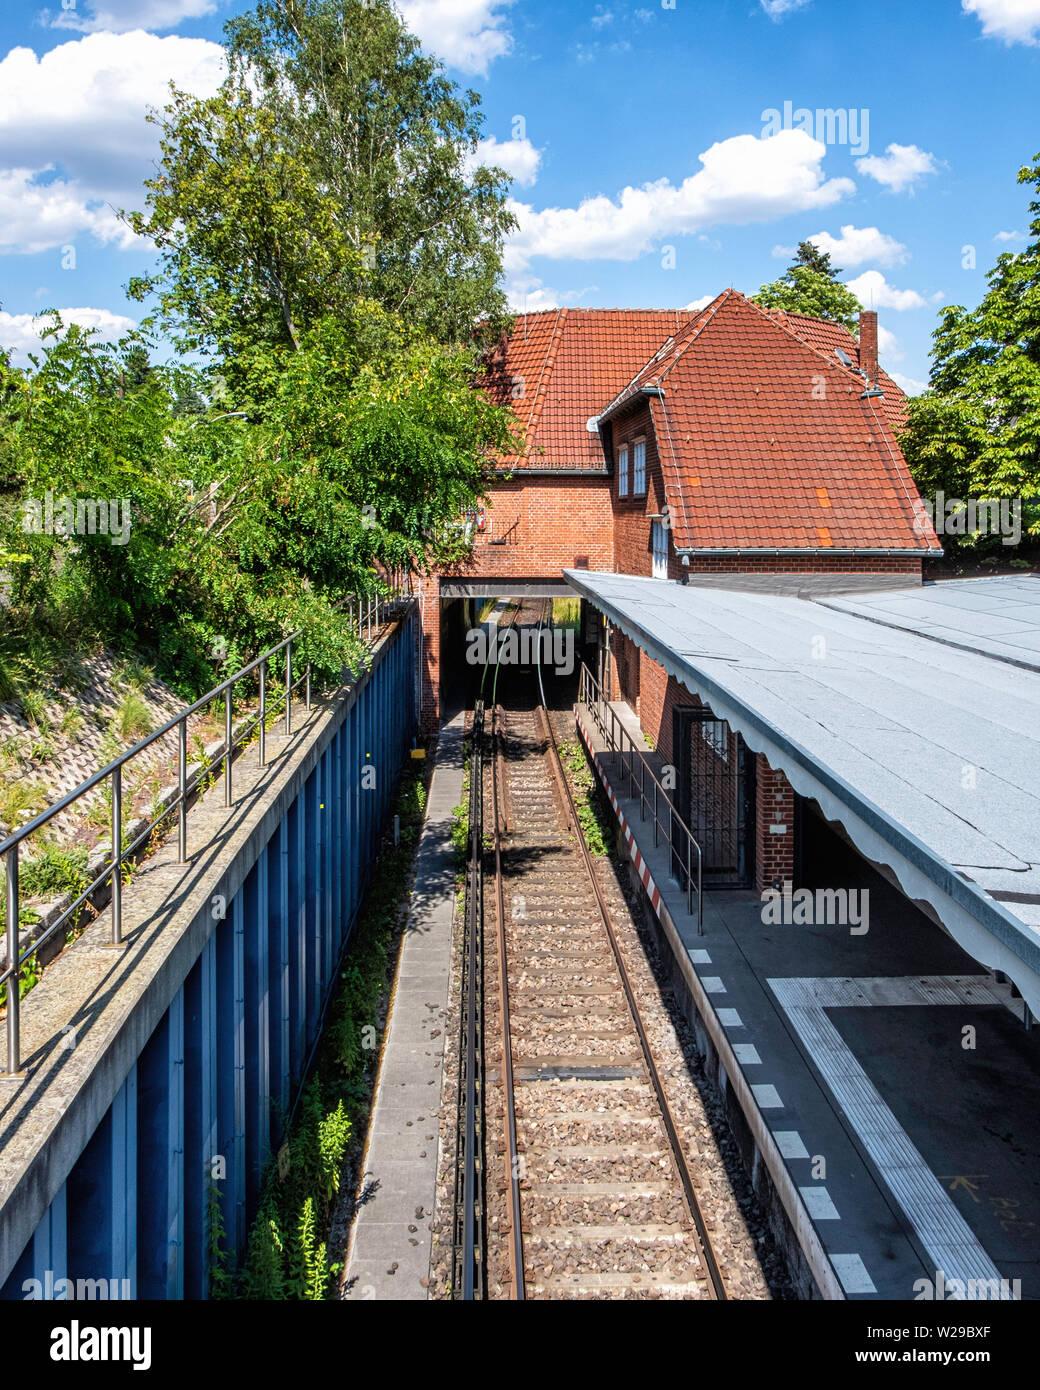 Freie Universität Thielplatz U-bahn underground railway station serves U3 line. Platform & rail tracks. - Stock Image